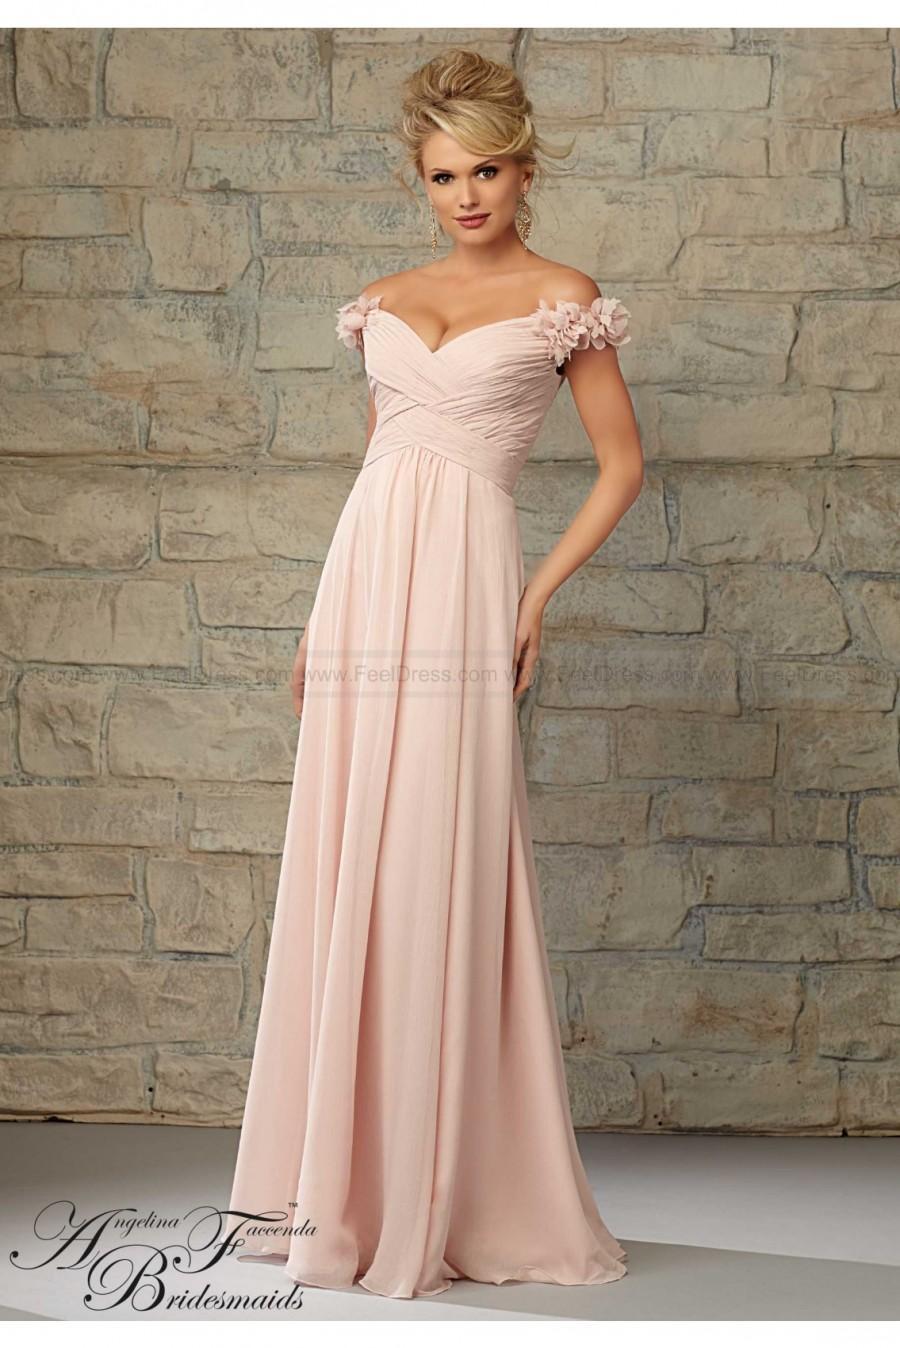 Boda - Mori Lee Bridesmaids Dress Style 20453